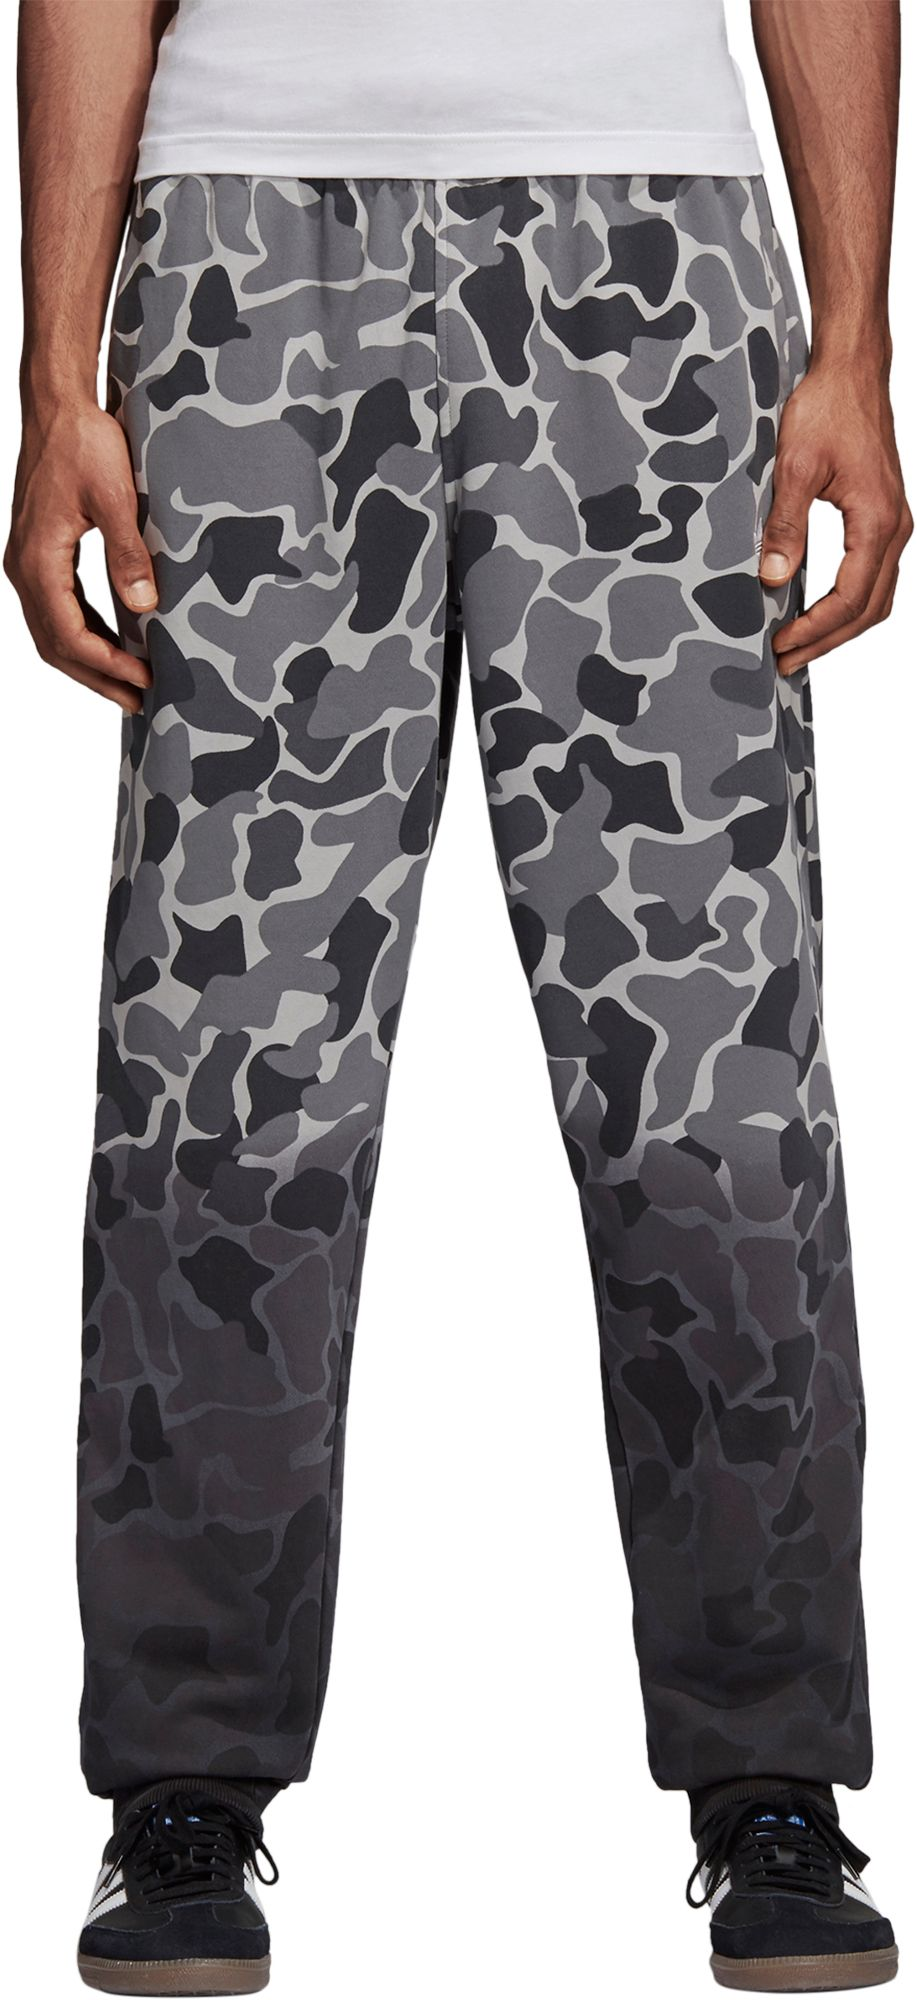 adidas Originals Men's Camo (Green) Dipped Pants, Size: Small thumbnail